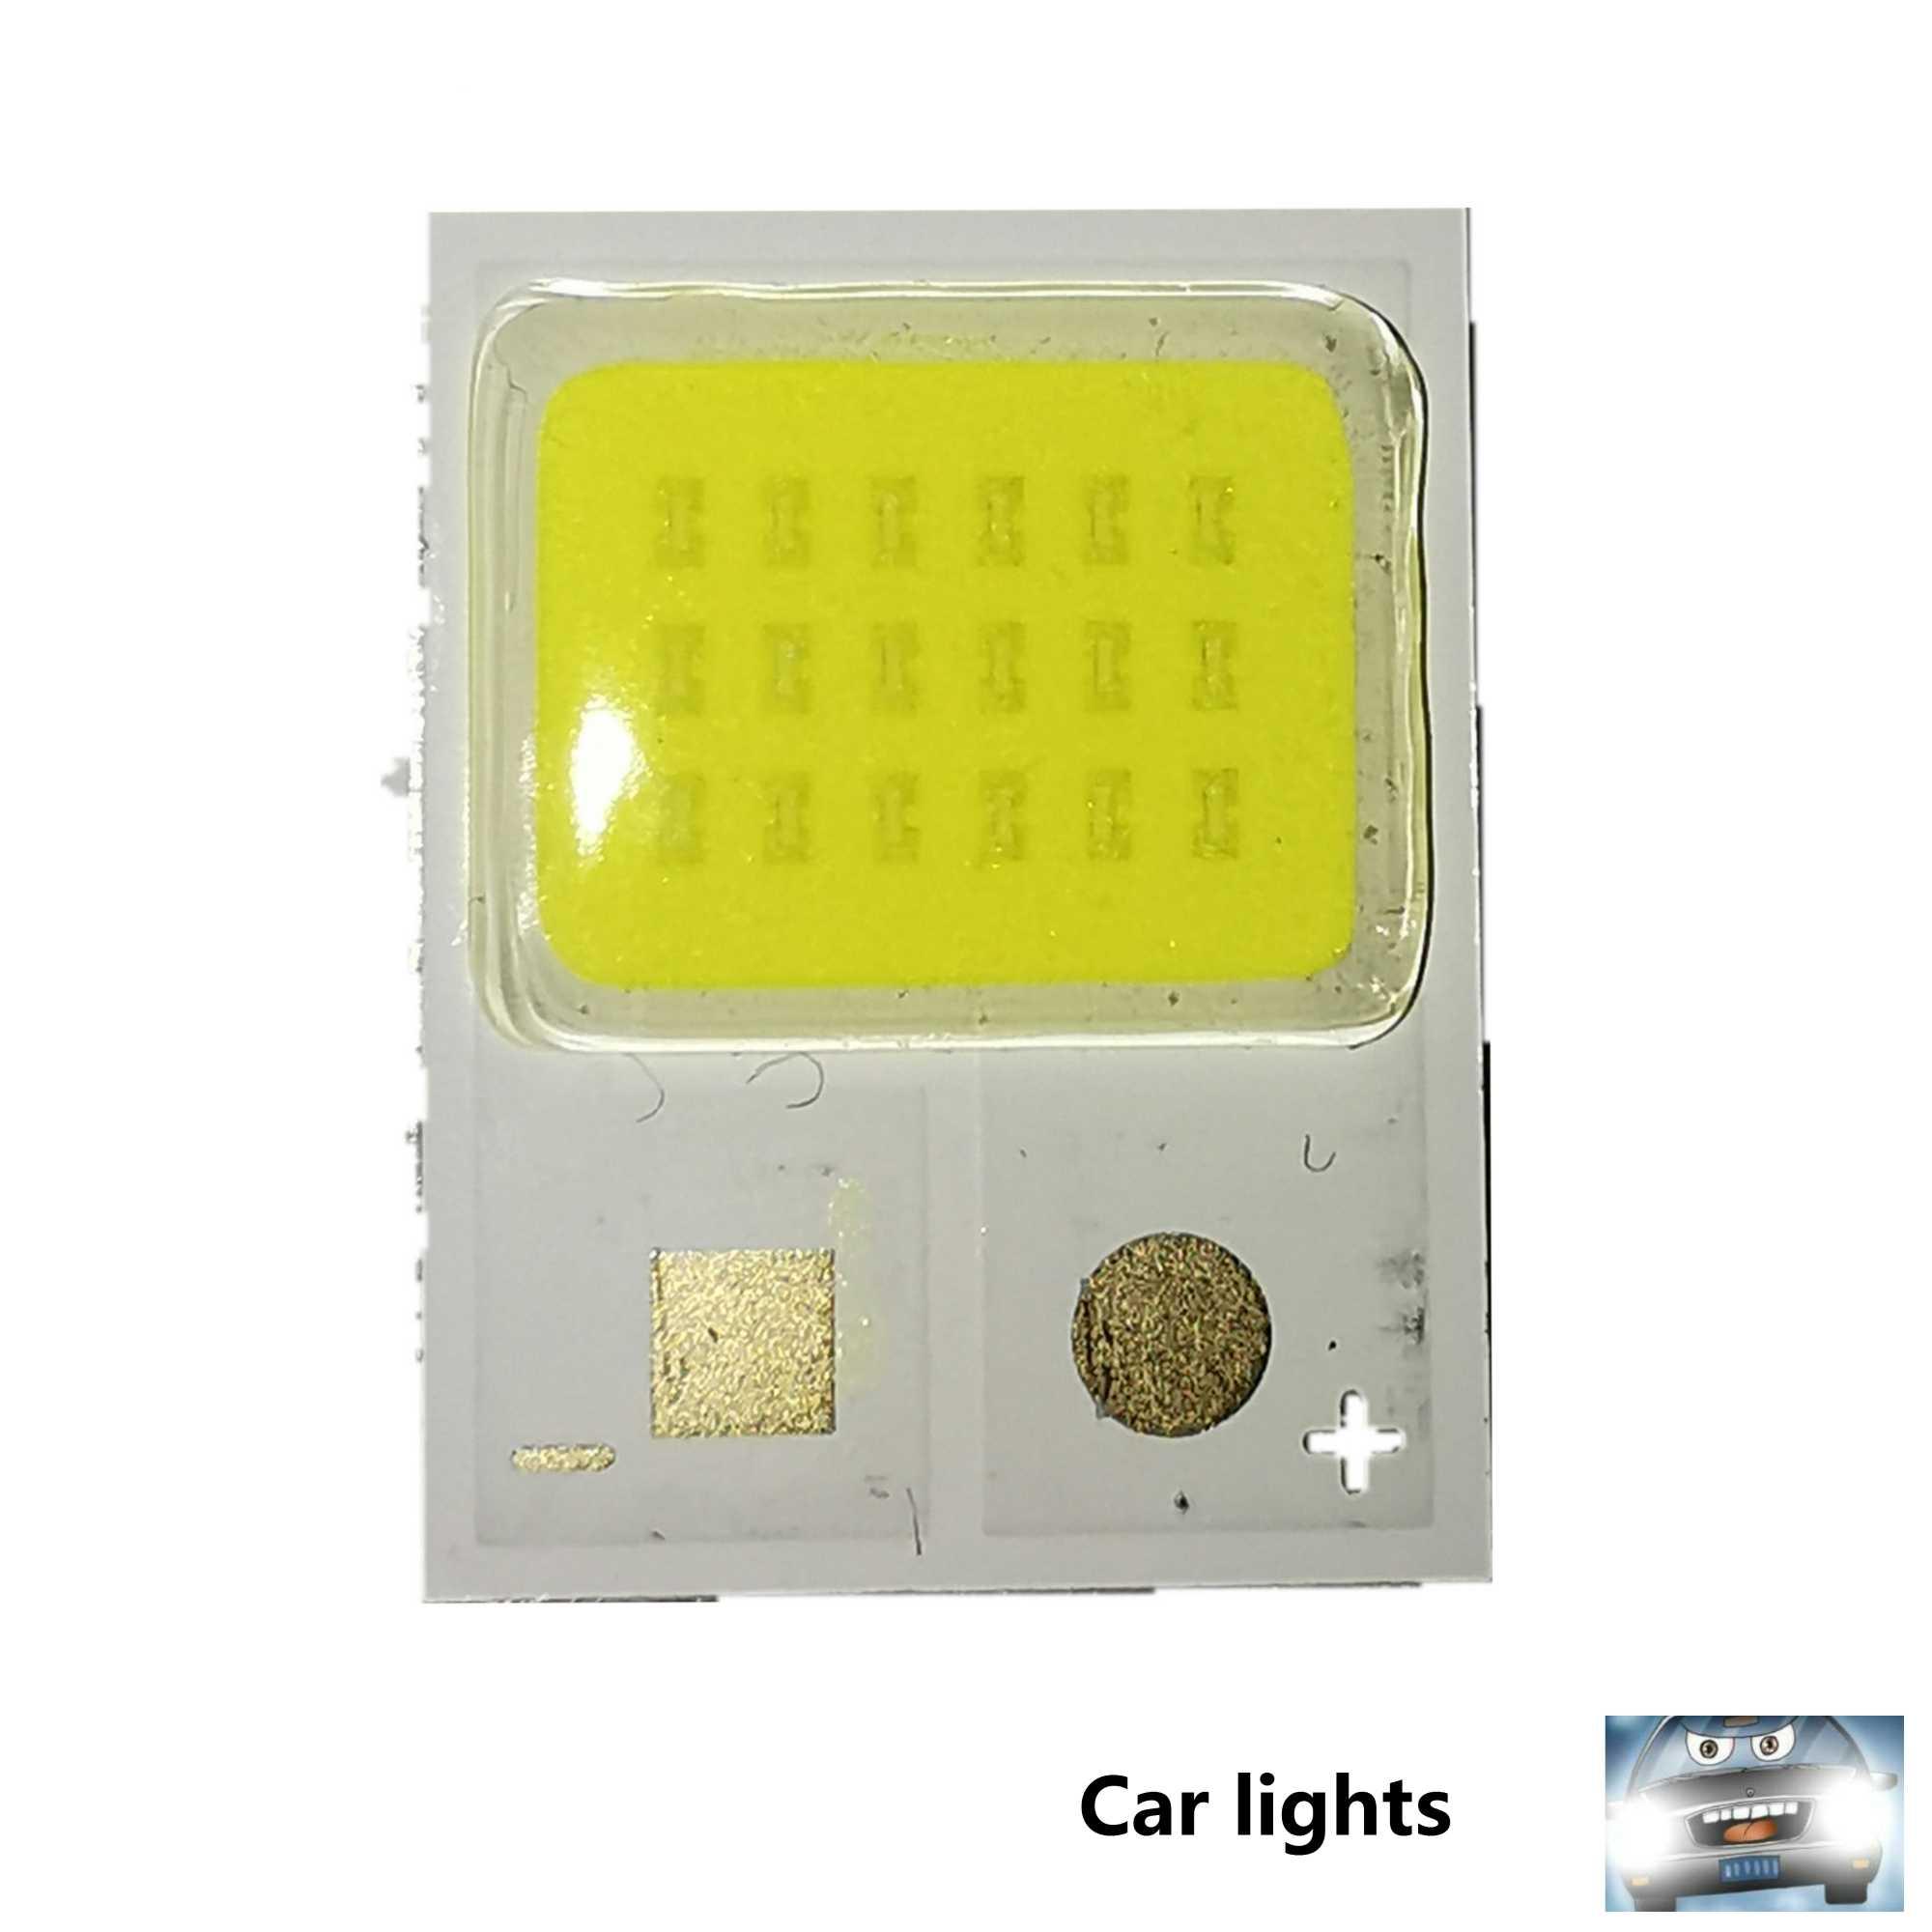 1 Uds número 6 C6 coche bombillas de faros H1 H3 H7 H11 9005 de 9006 de luces LED del coche H4 9004 9007 H13 Hi-Lo haz de estilo